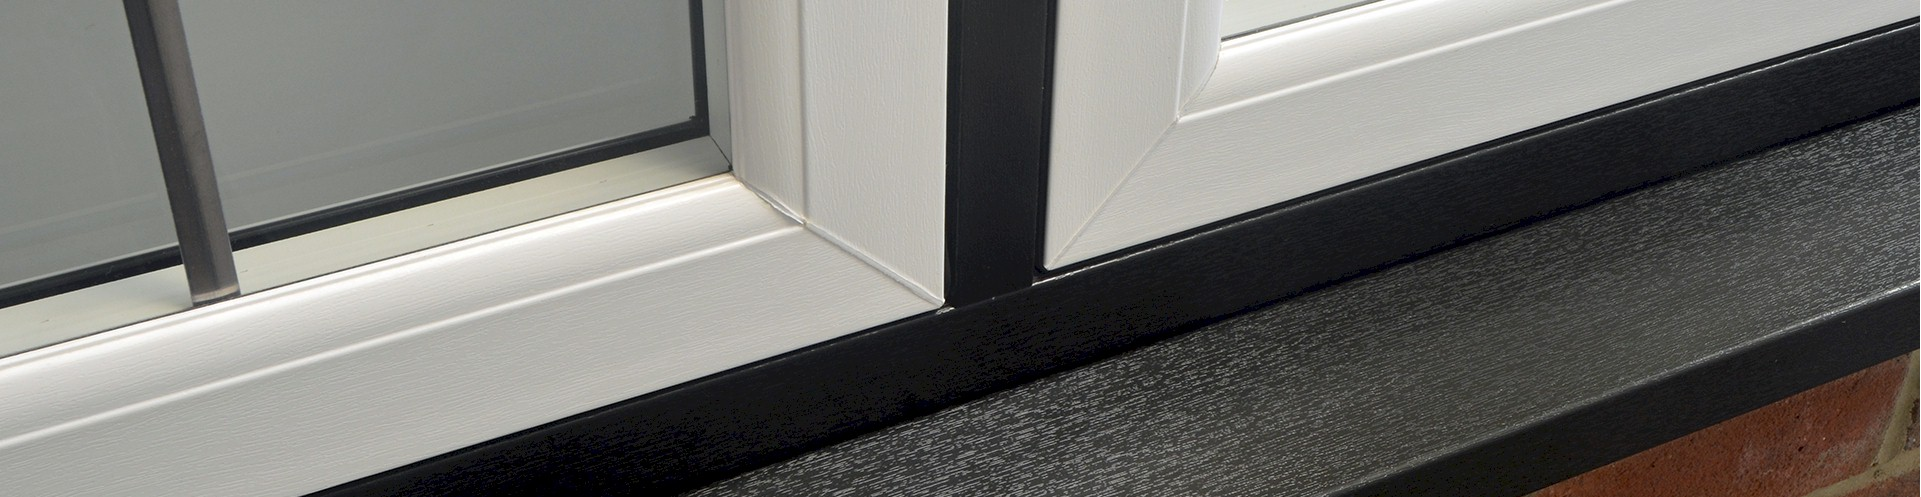 Manufacturer of upvc plastic double glazed windows for Double glazing manufacturers